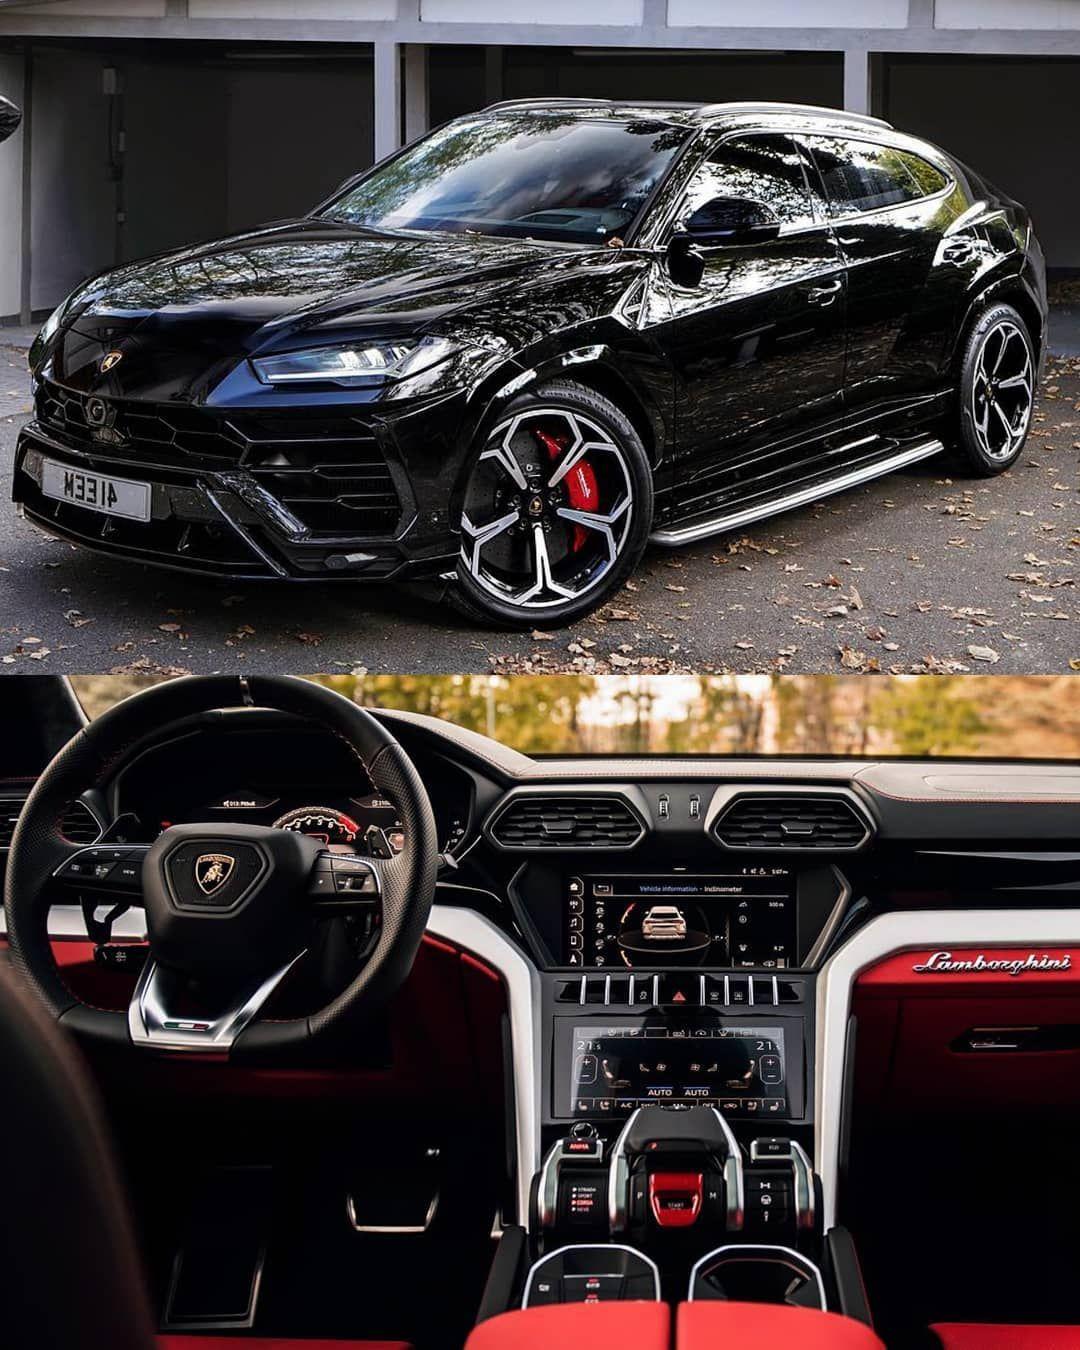 "👑 LUXURY IS A LIFESTYLE 👑 on Instagram: ""Lamborghini Urus 2019 🔥🔥 Black Edition & red n black interior 🔛🔝💯✔😋😍😍 👉 @rokenr 👈 👉 @tonybet 👈  #highbosslife #mercedesbenz #g63 #amg…"""